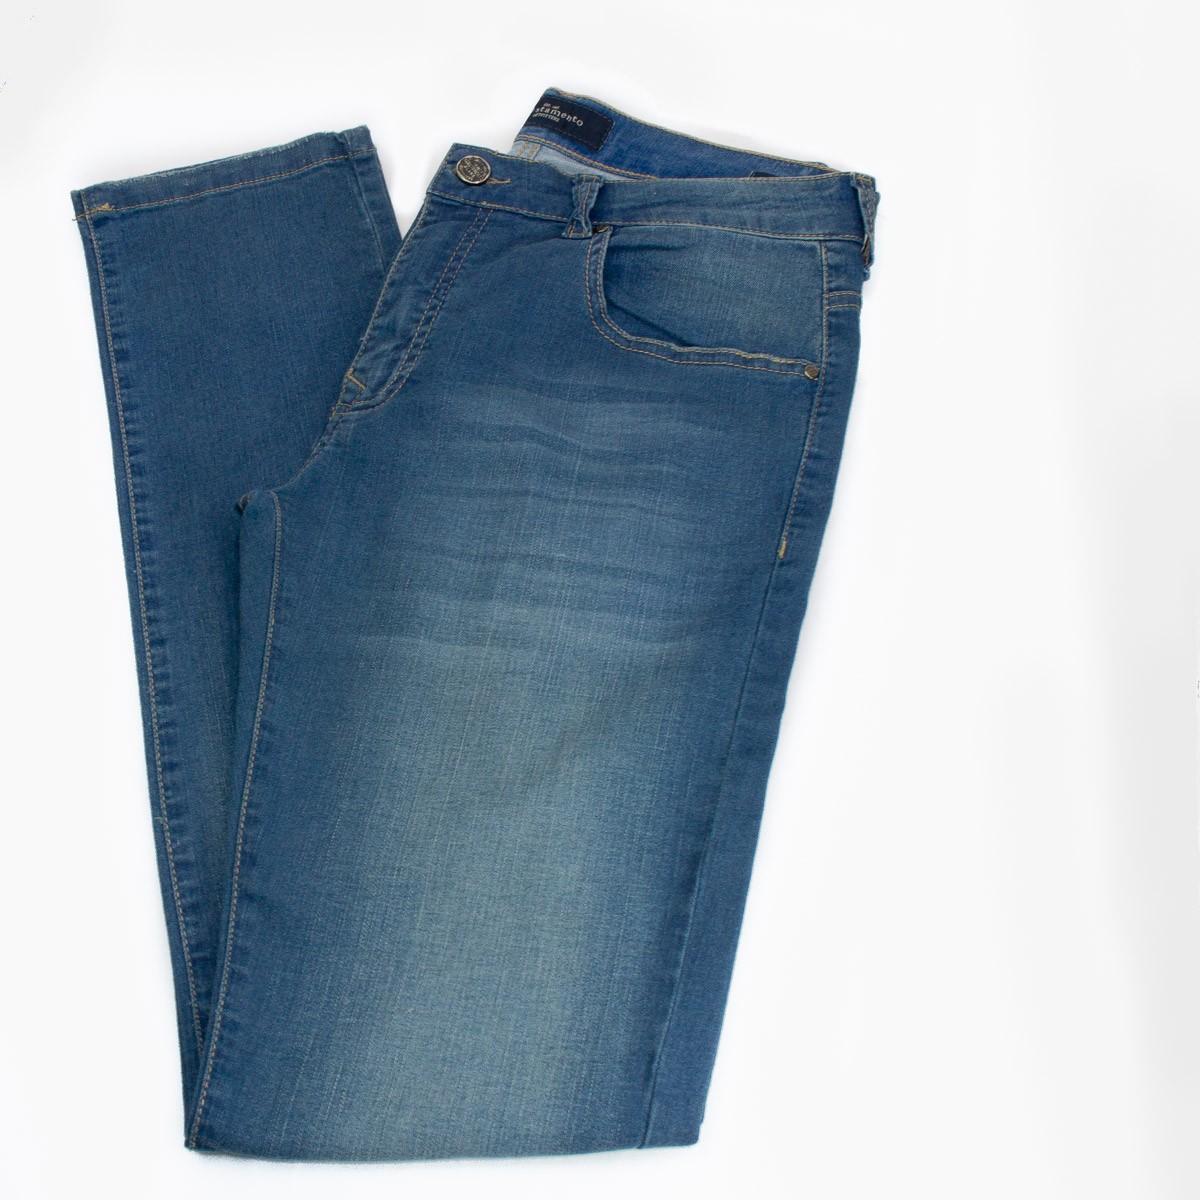 093cde391 Bizz Store - Calça Jeans Masculina Acostamento Skinny